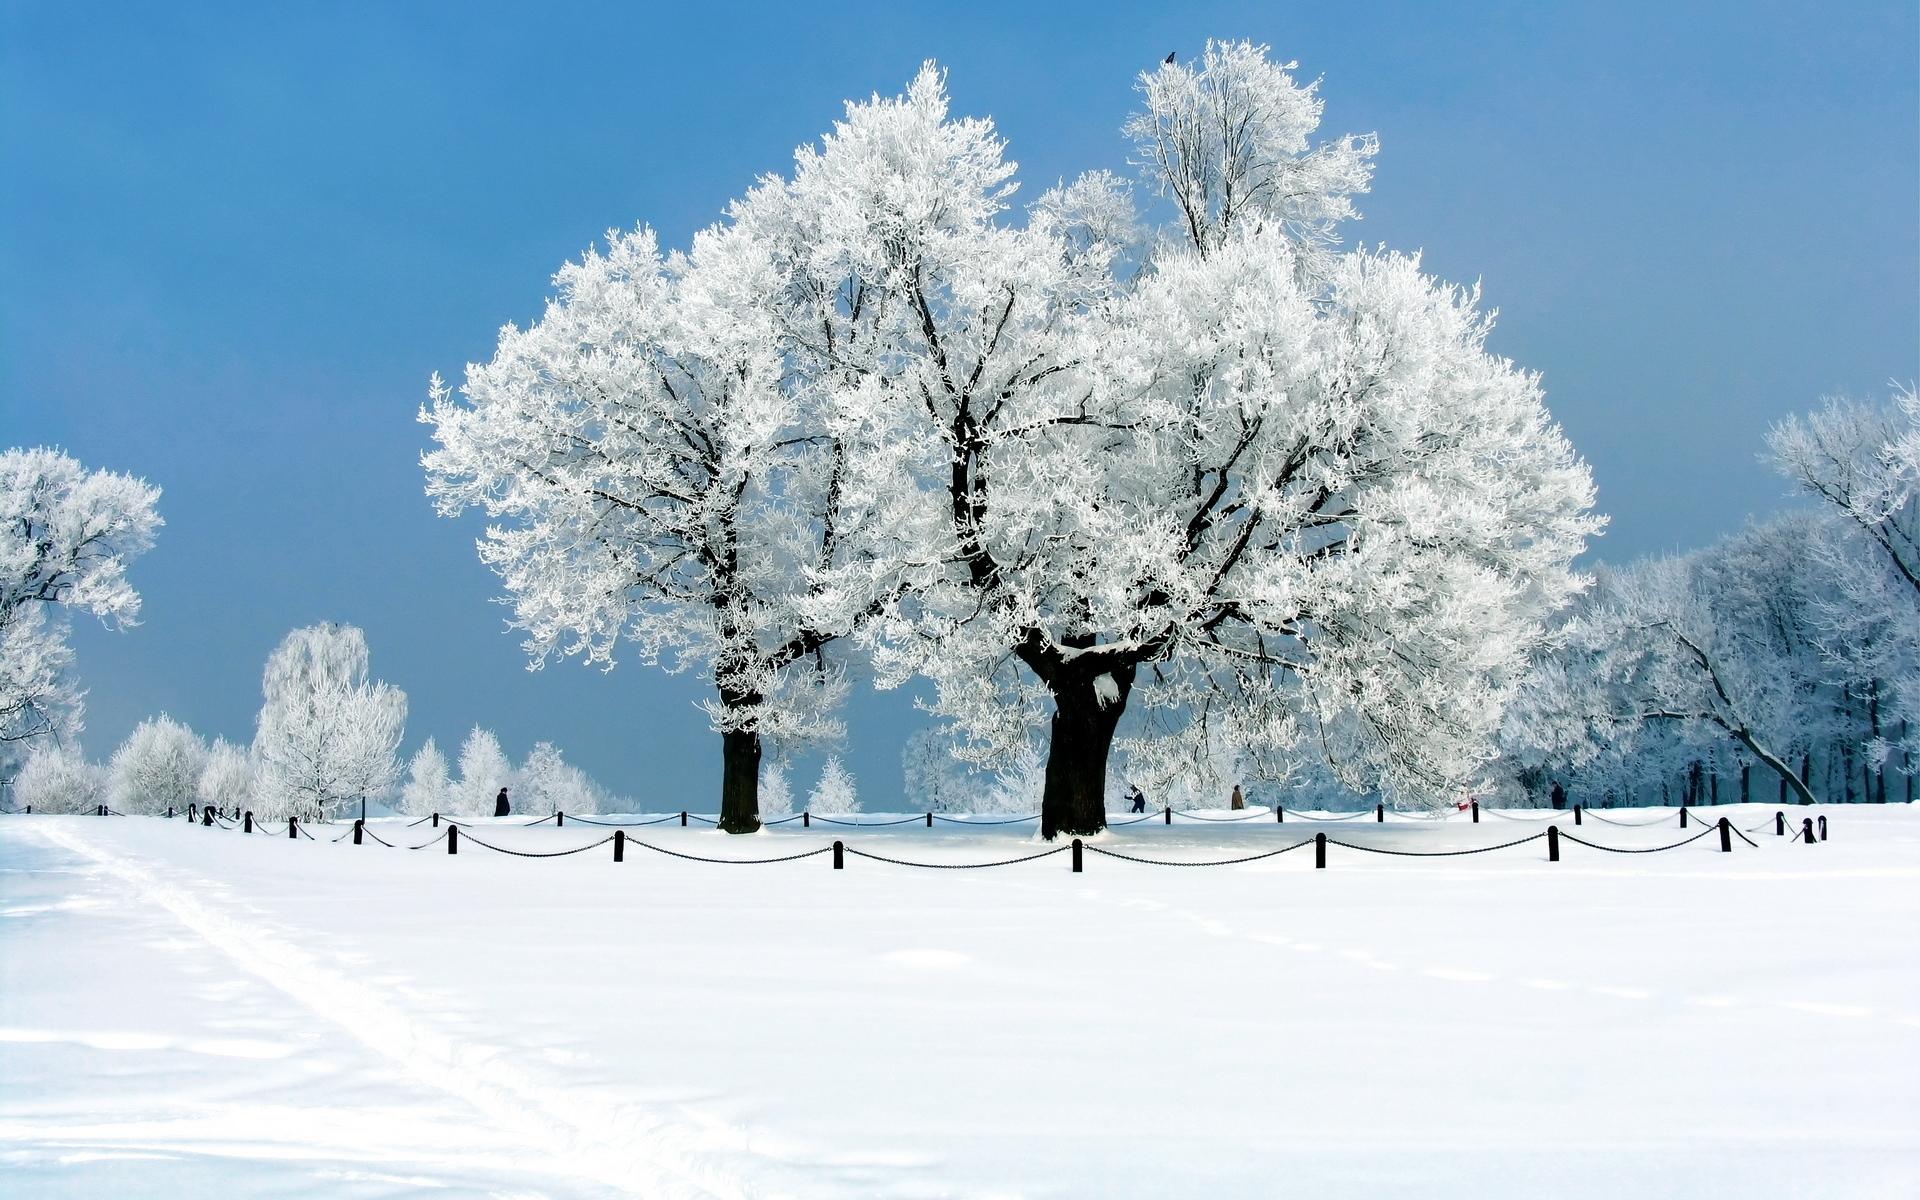 Snow covered winter nature HD Desktop Wallpaper HD Desktop Wallpaper 1920x1200